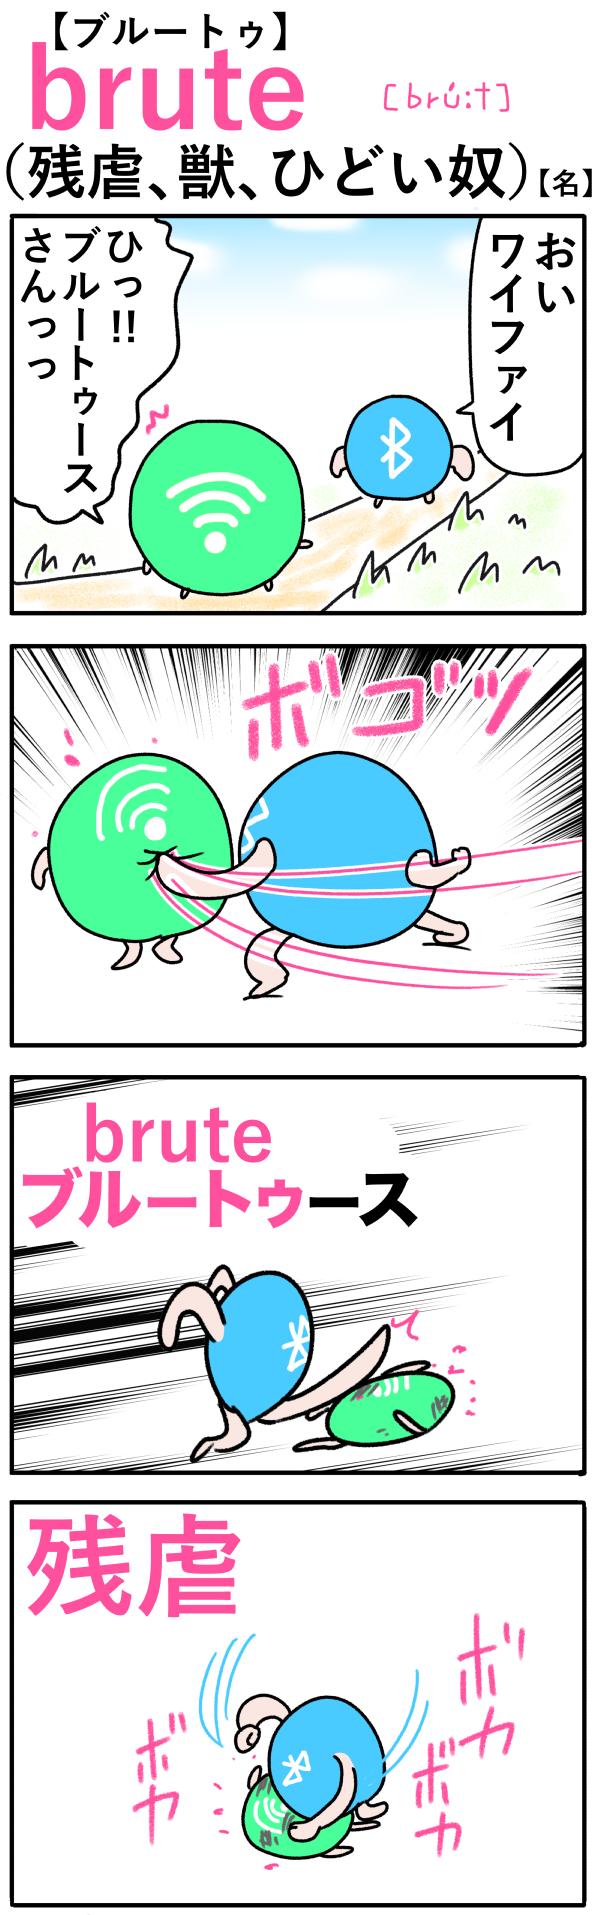 brute(残虐、獣)の語呂合わせ英単語